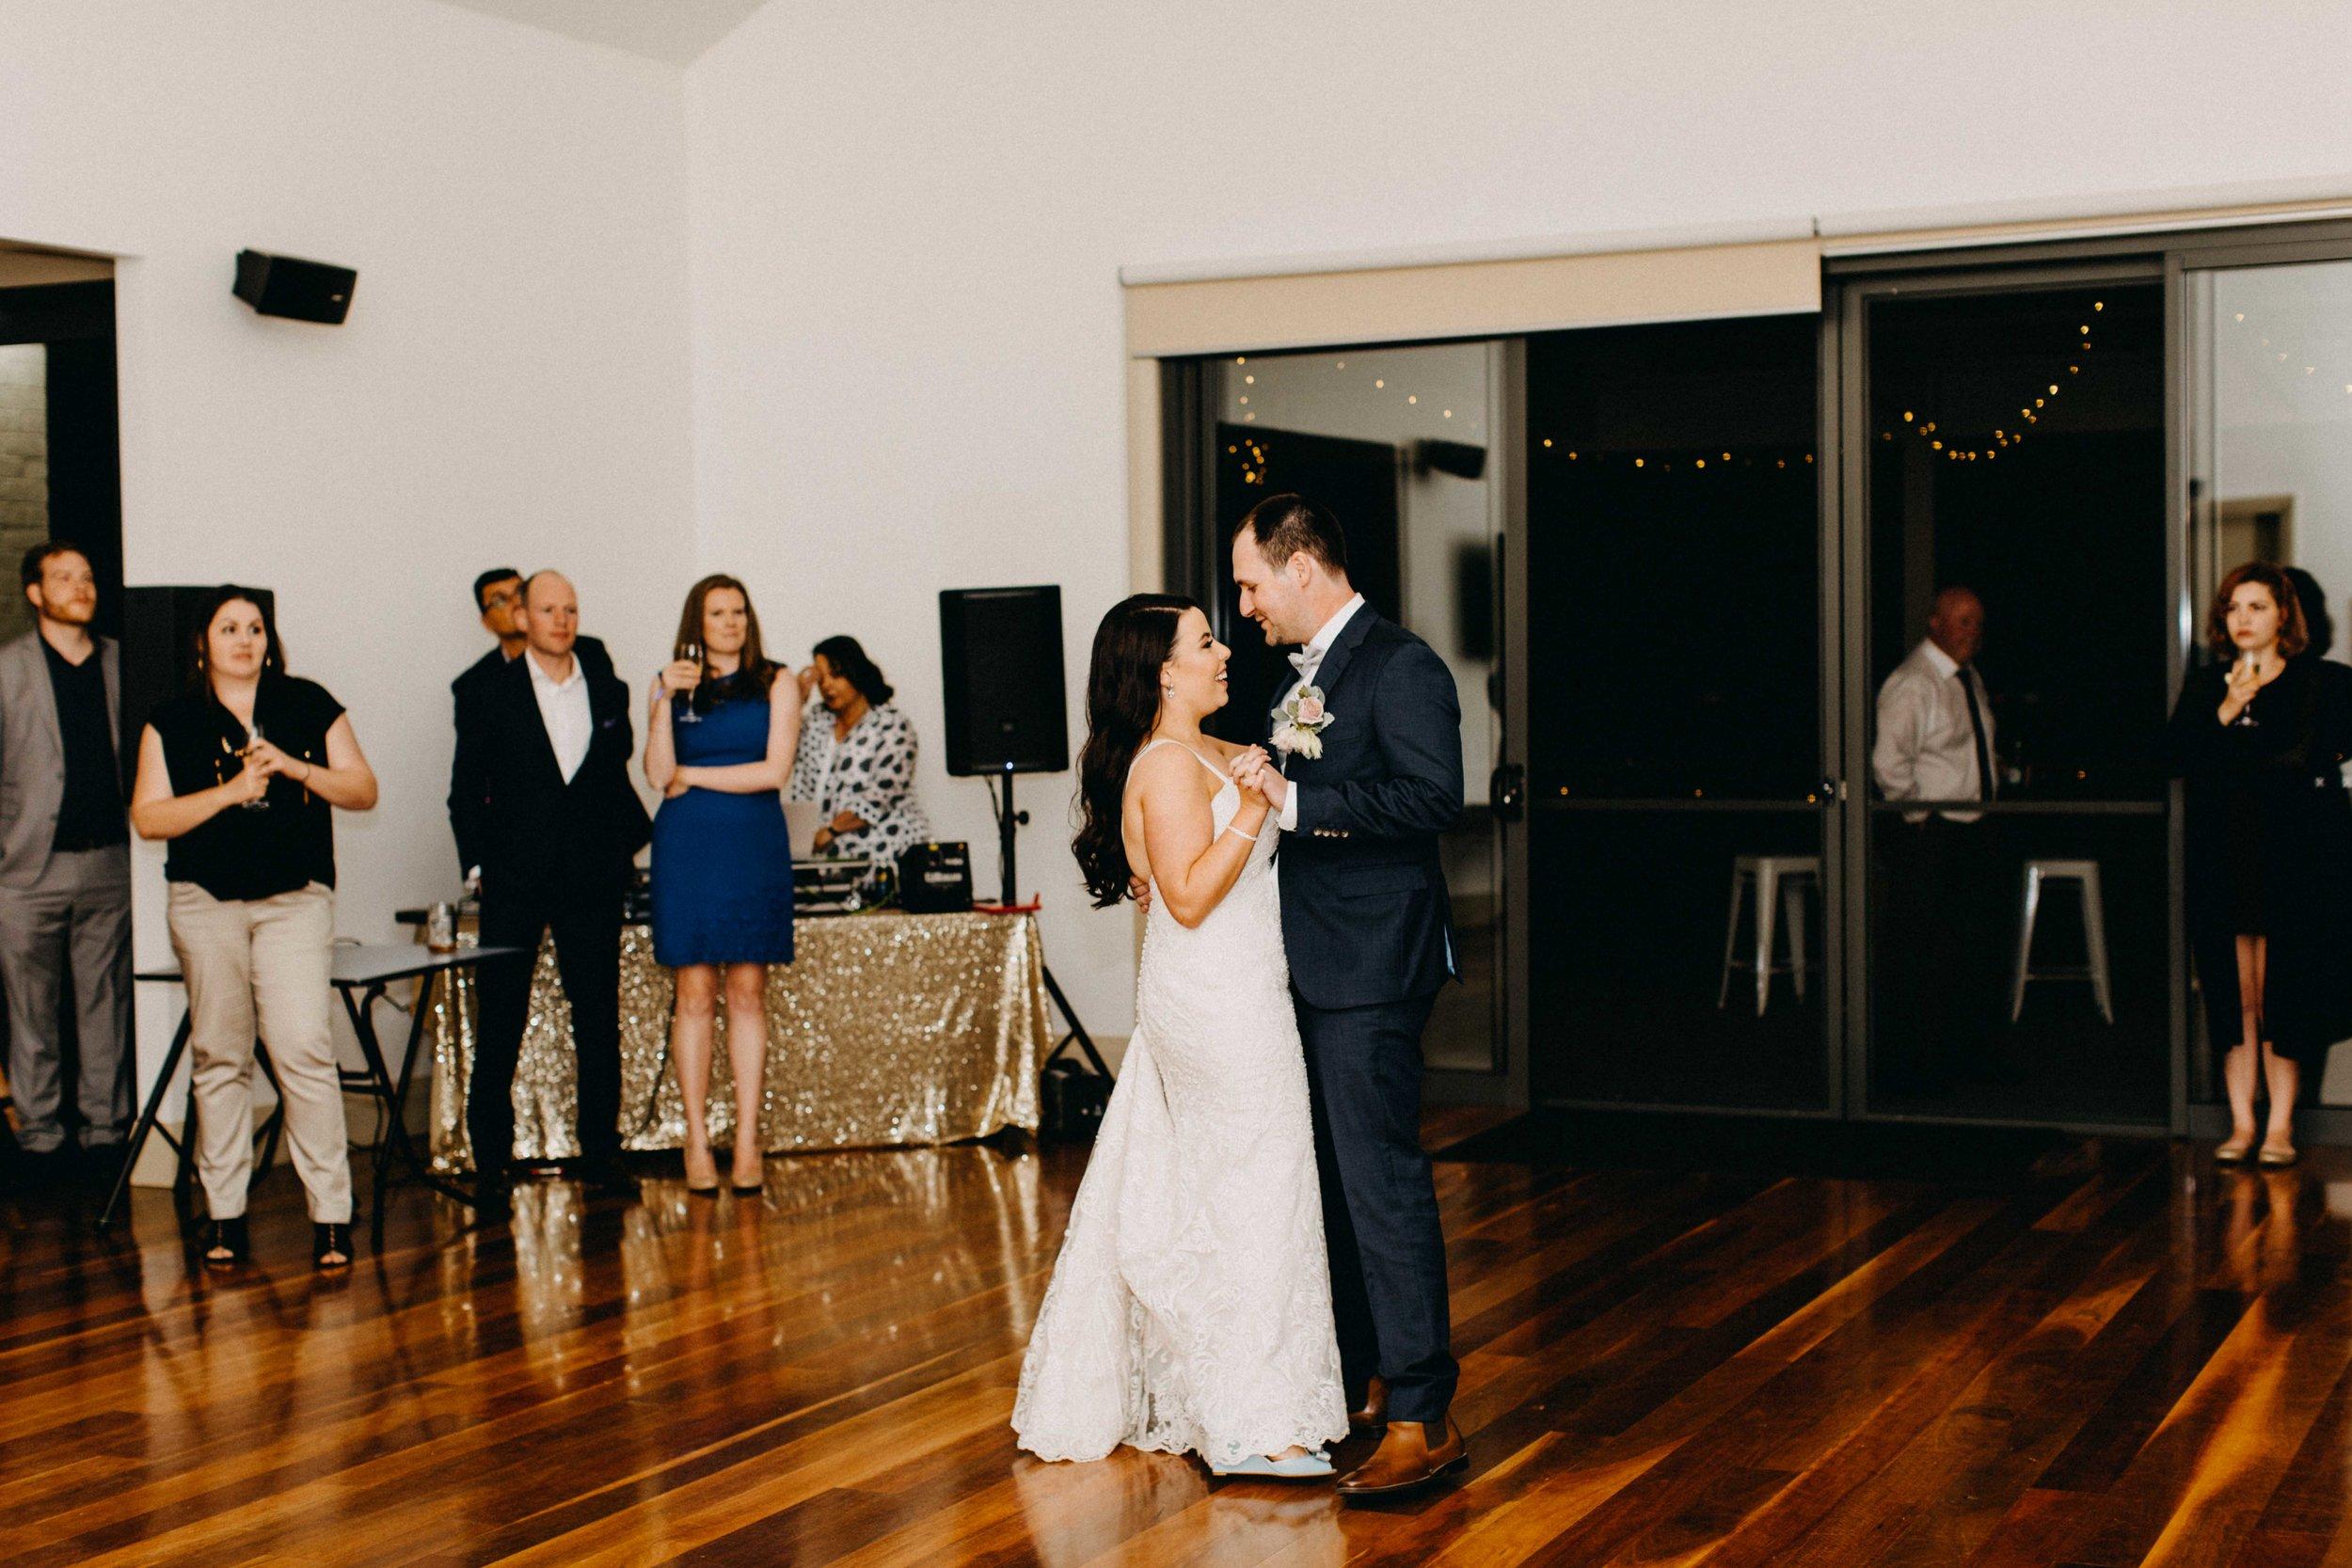 exeter-southern-highlands-wedding-www.emilyobrienphotography.net -148.jpg